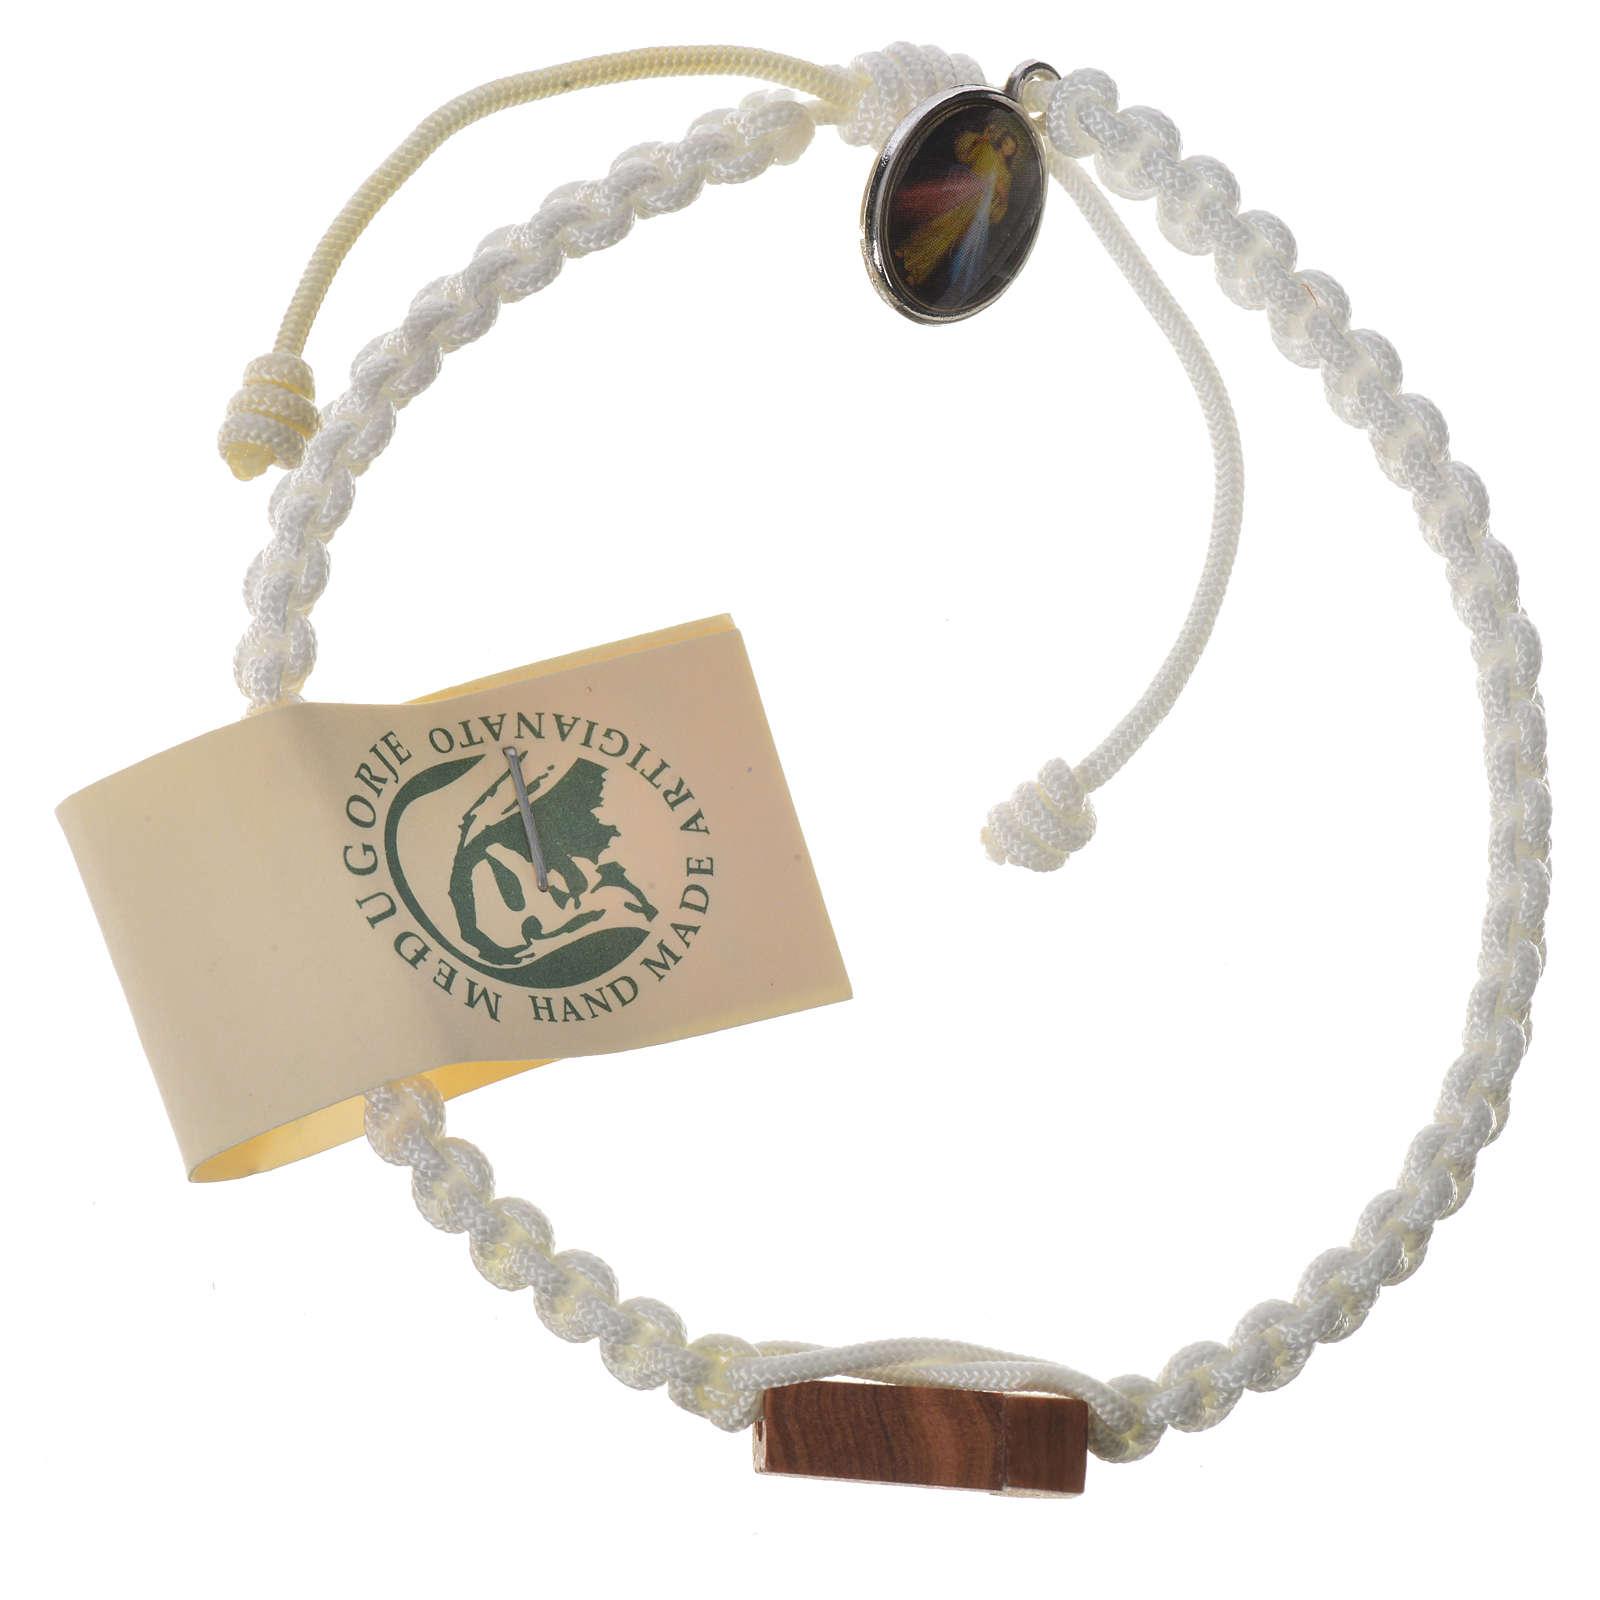 Bracelet corde Medjugorje croix olivier différents coloris 4